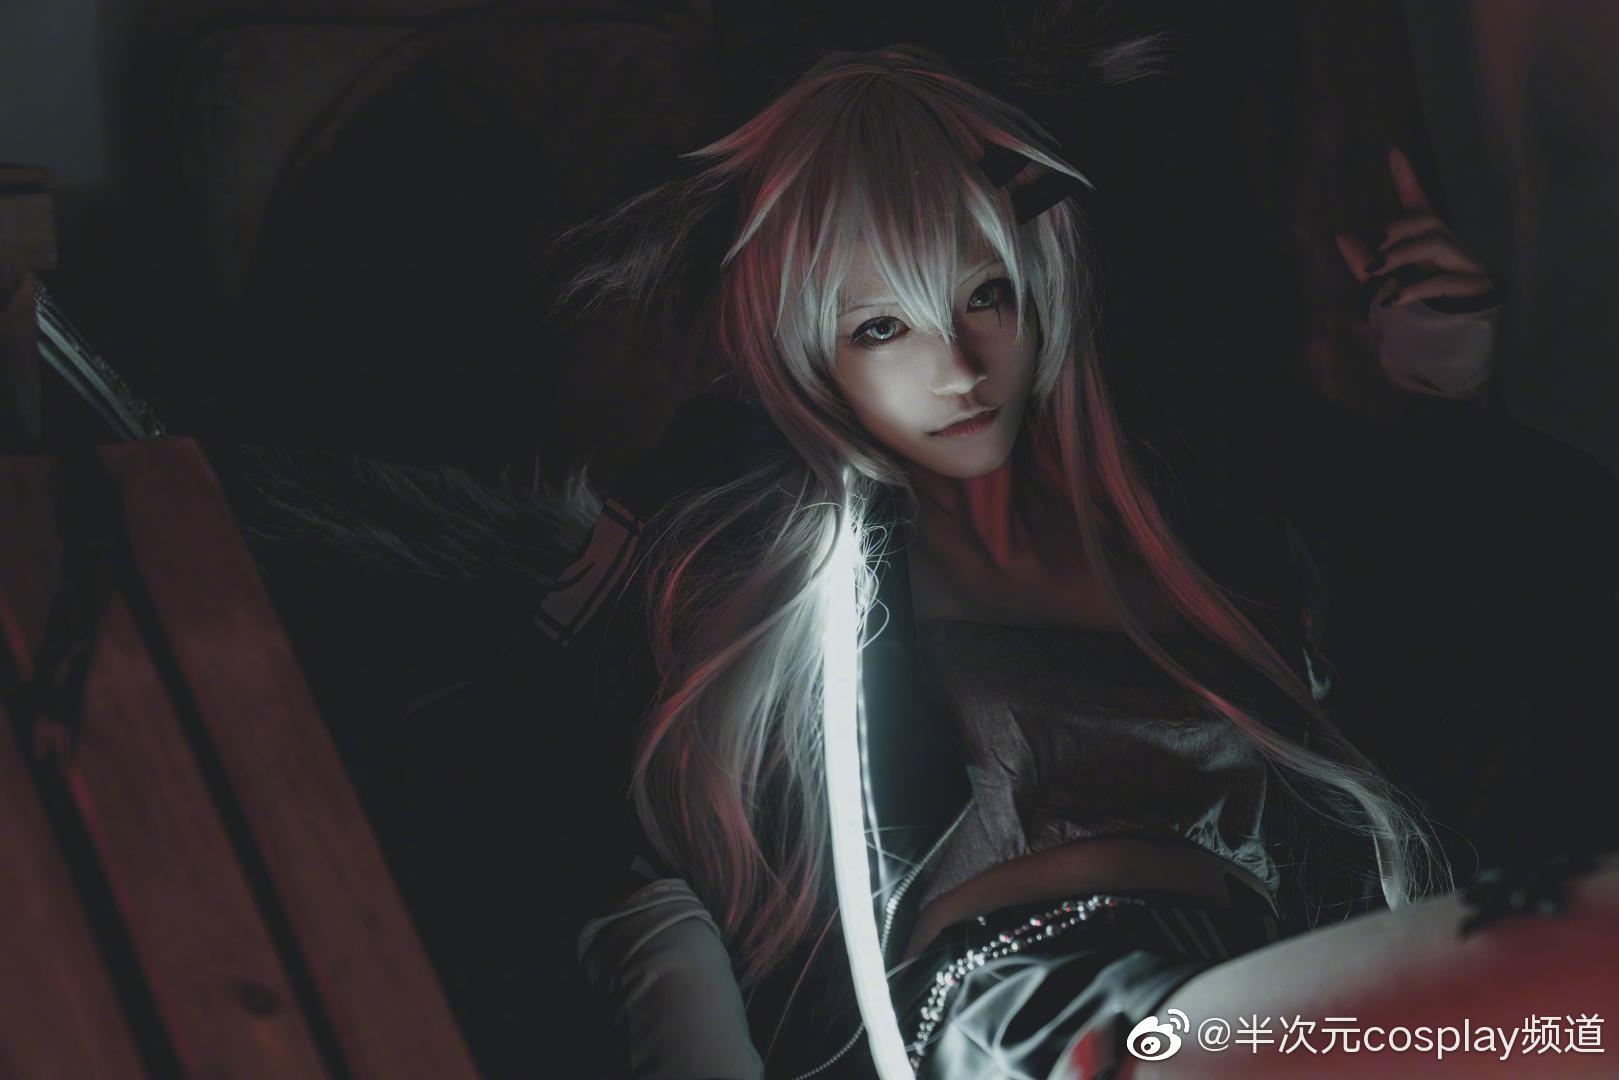 【COS】角色扮演433